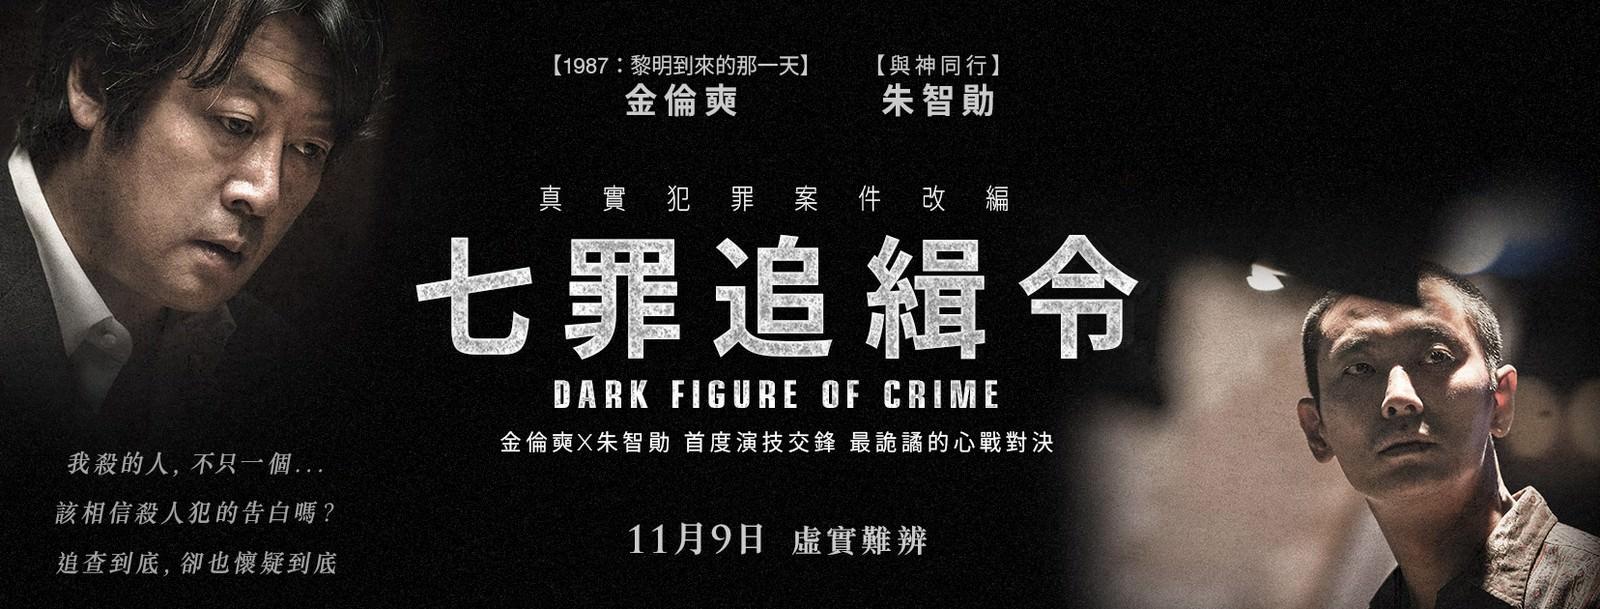 Movie, 암수살인(韓國, 2018年) / 七罪追緝令(台灣) / Dark Figure of Crime(英文) / 暗数杀人(口語), 電影海報, 台灣, 橫版